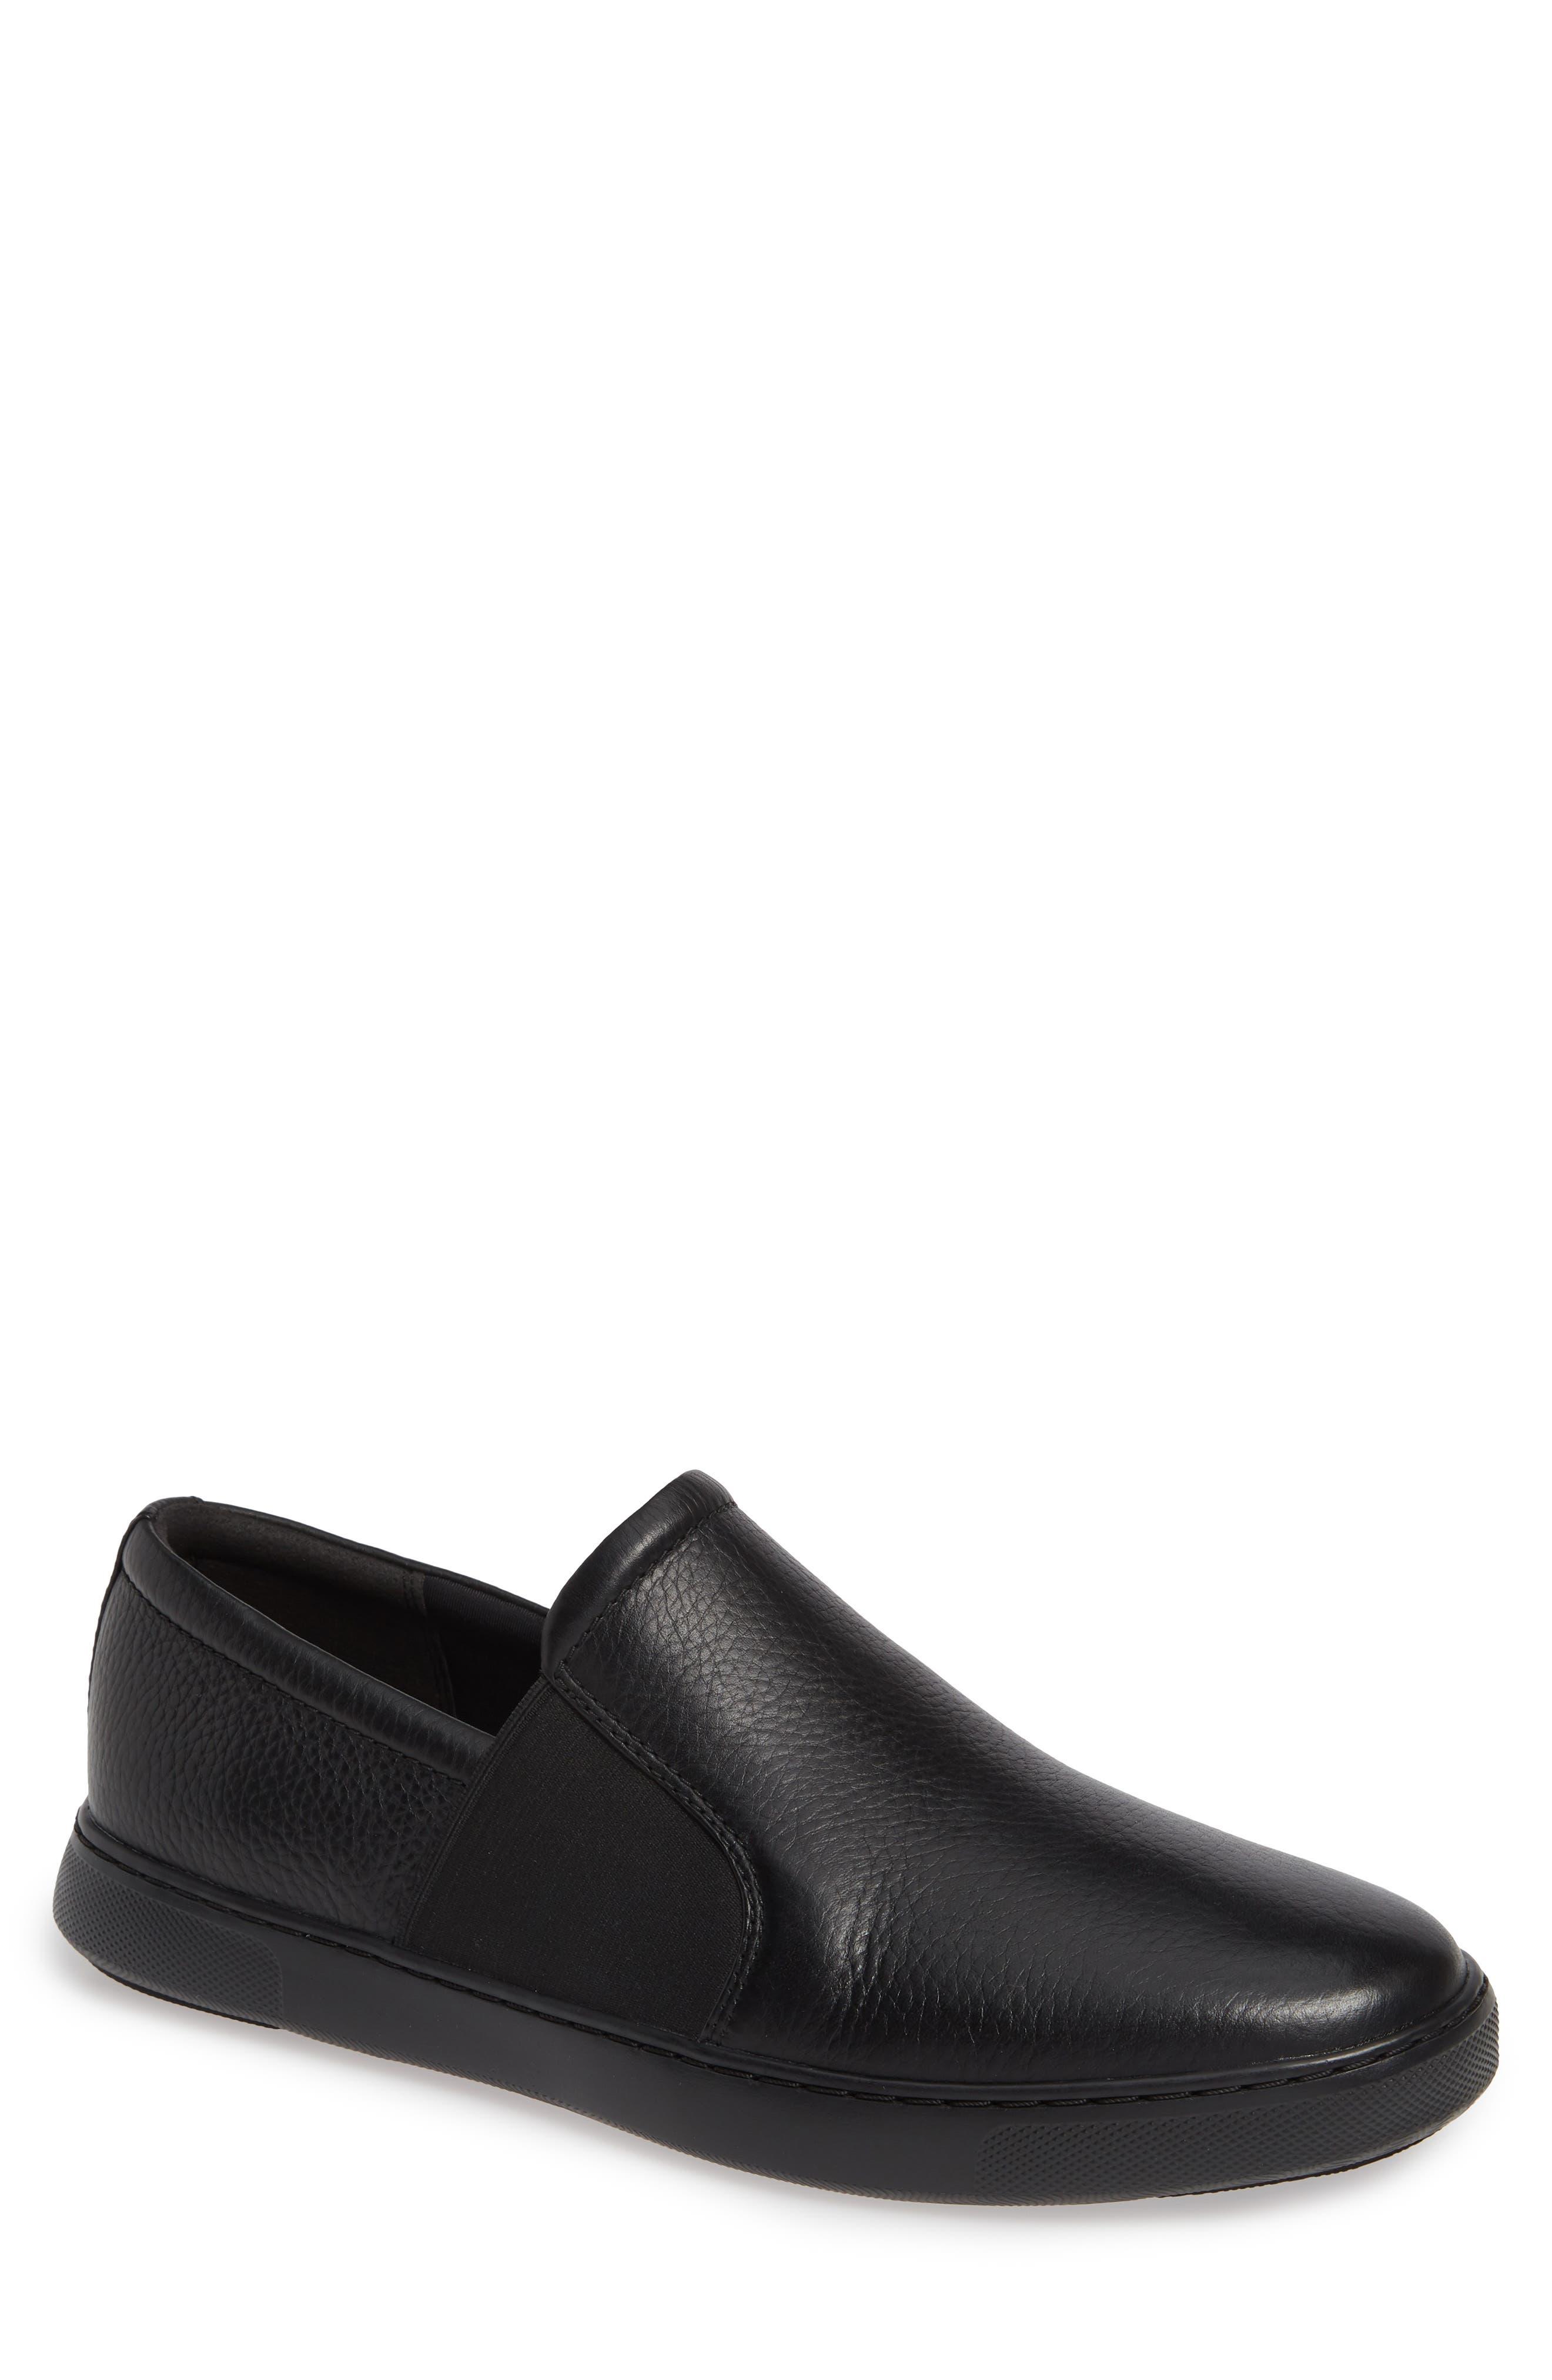 FITFLOP Collins Slip-On Sneaker, Main, color, BLACK